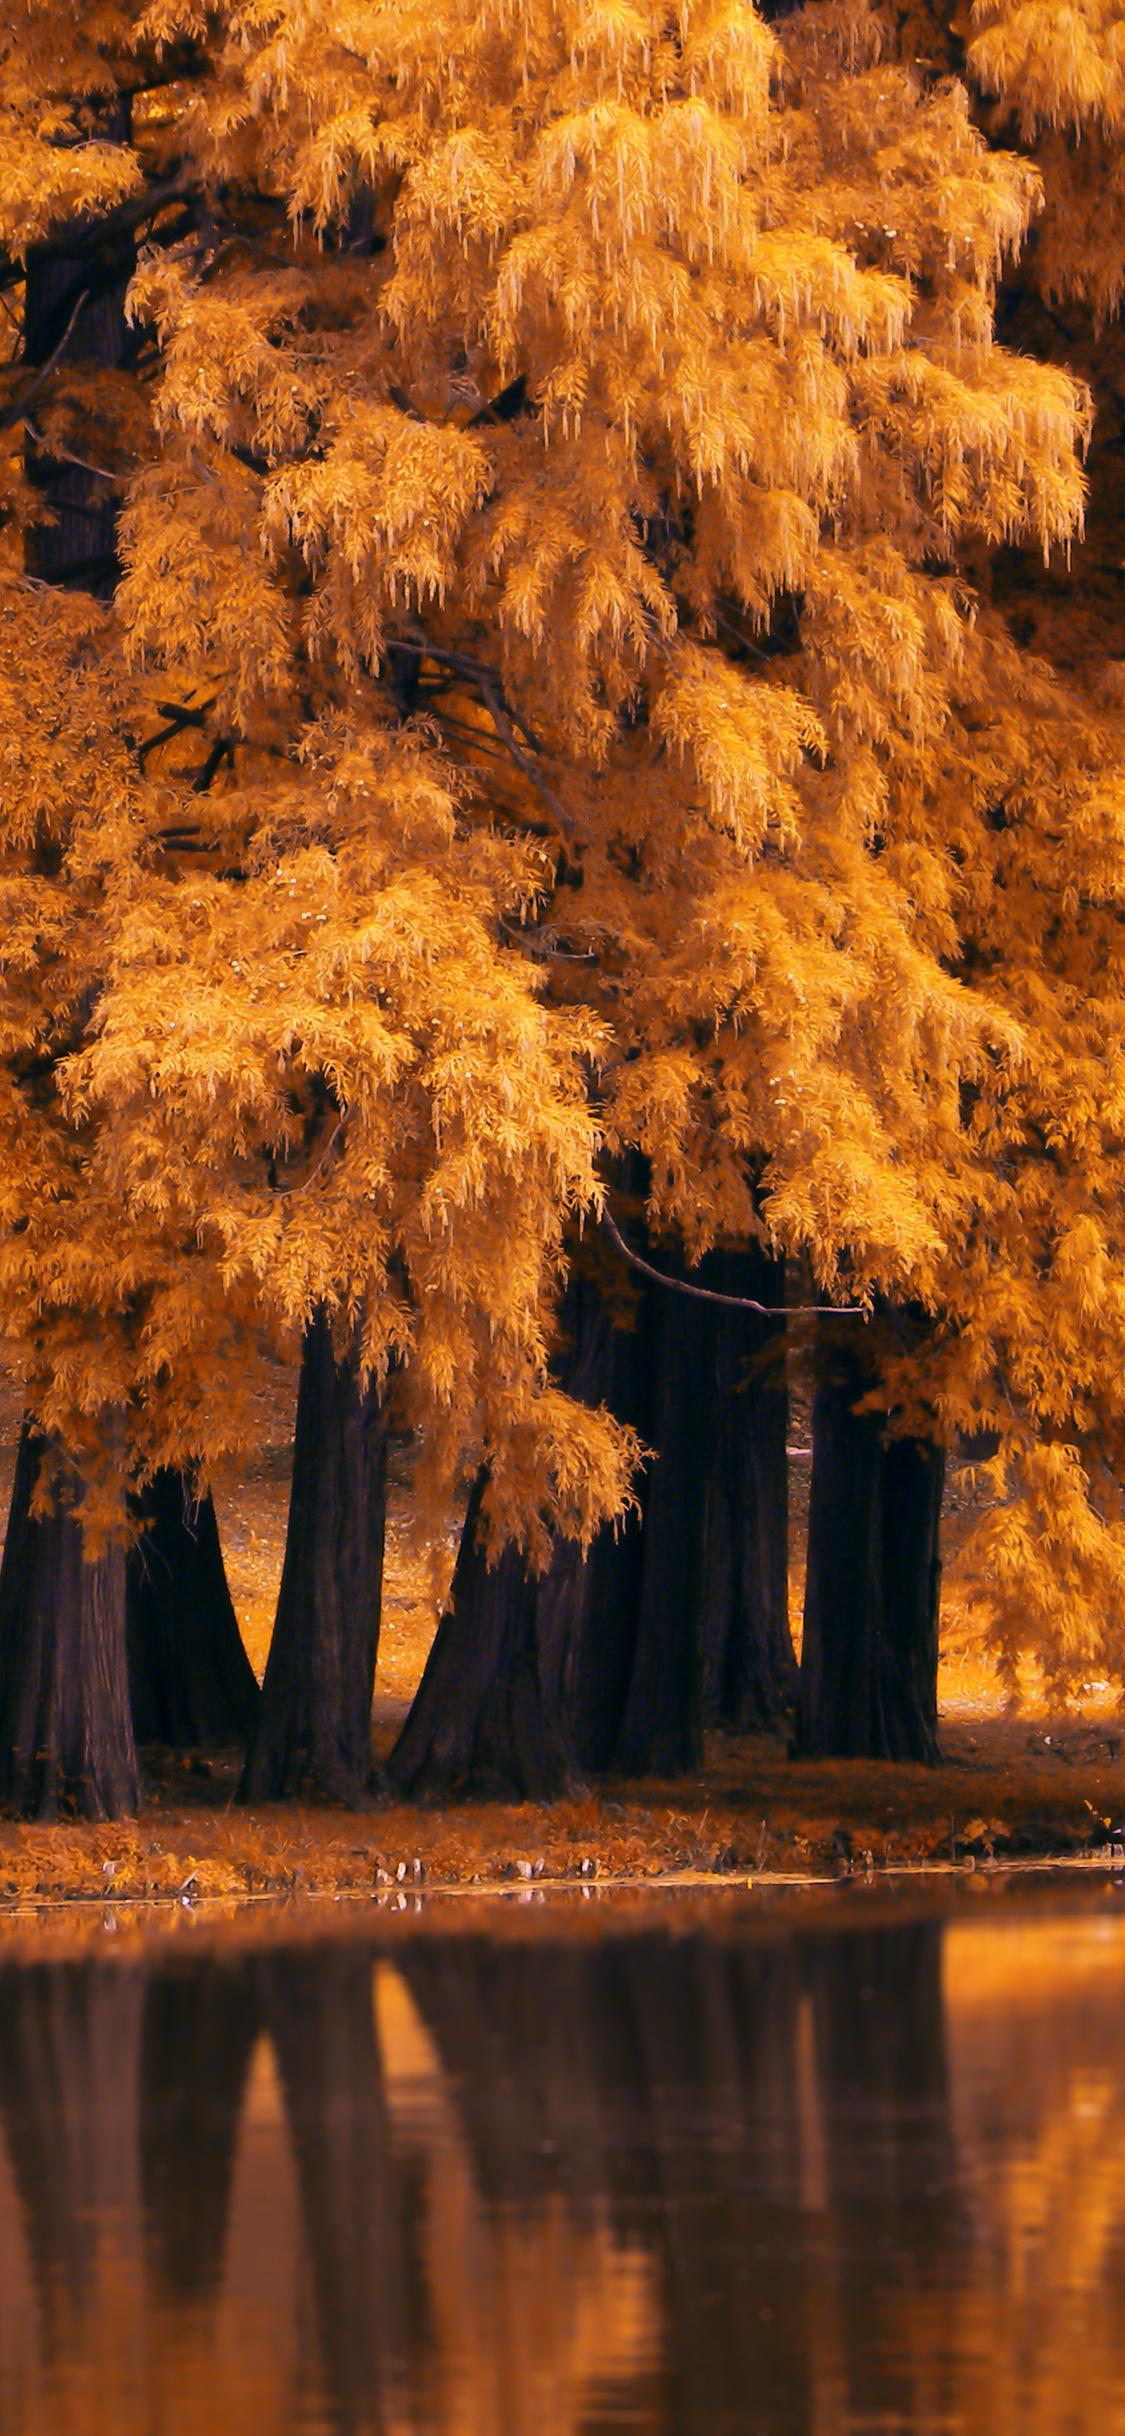 1125x2436 Autumn Fall Nature 4k Iphone Xs Iphone 10 Iphone X